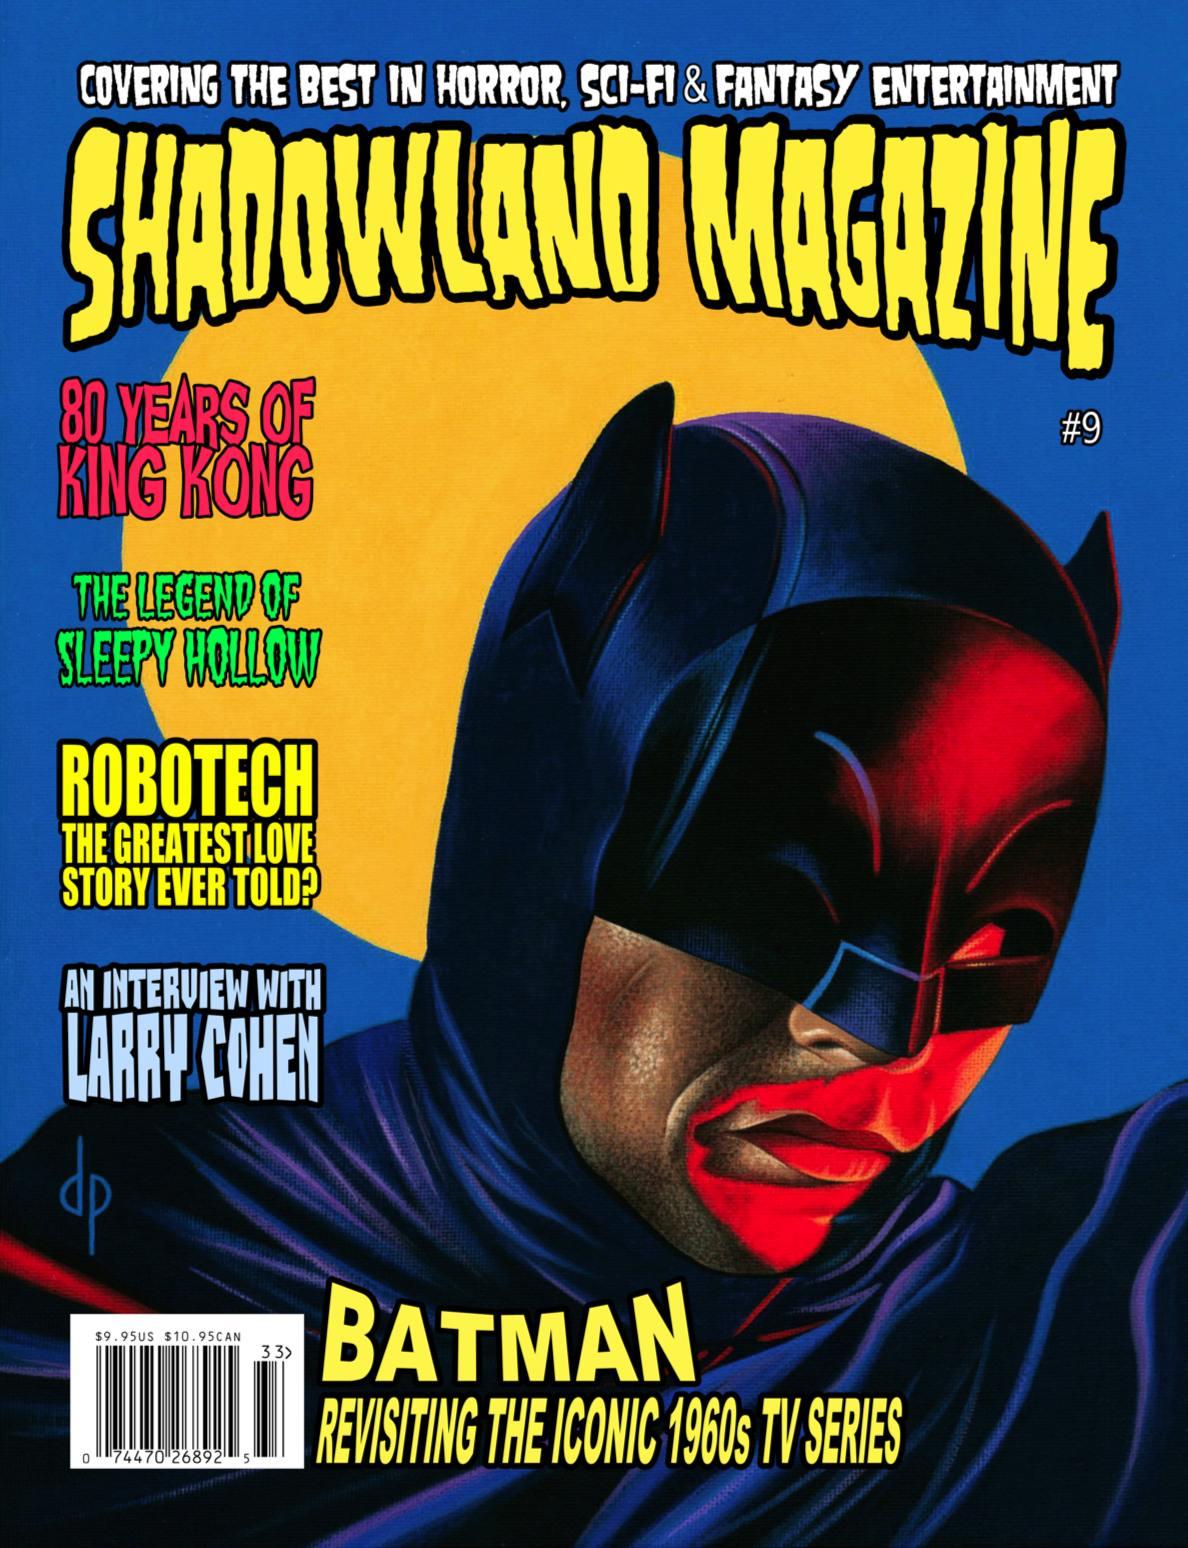 Favorite New Magazine: Shadowland #9 (Batman, King Kong, Sleepy Hollow)